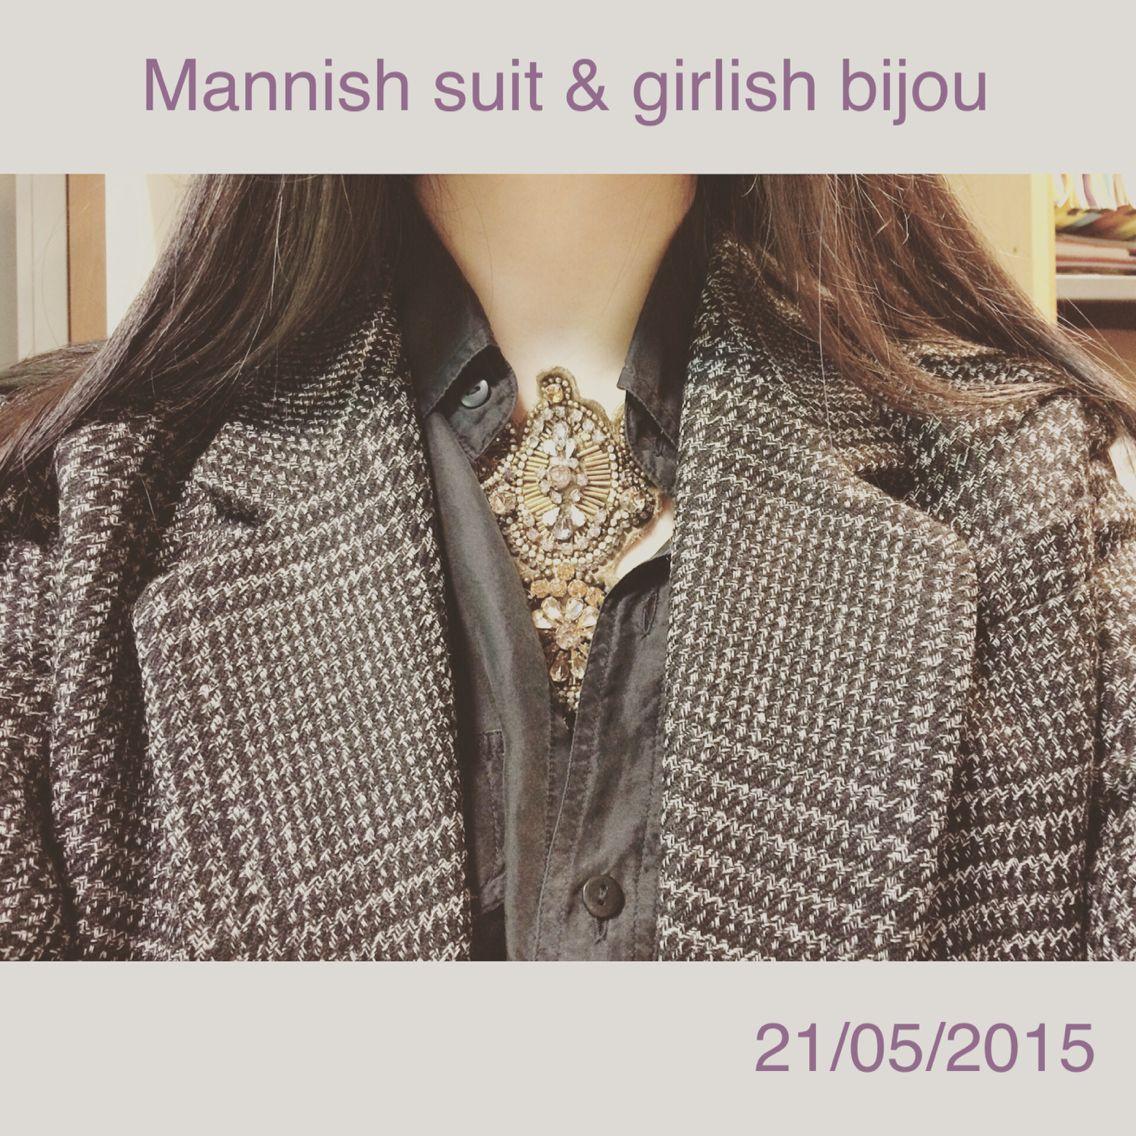 Mannish suit & Girlish bijou